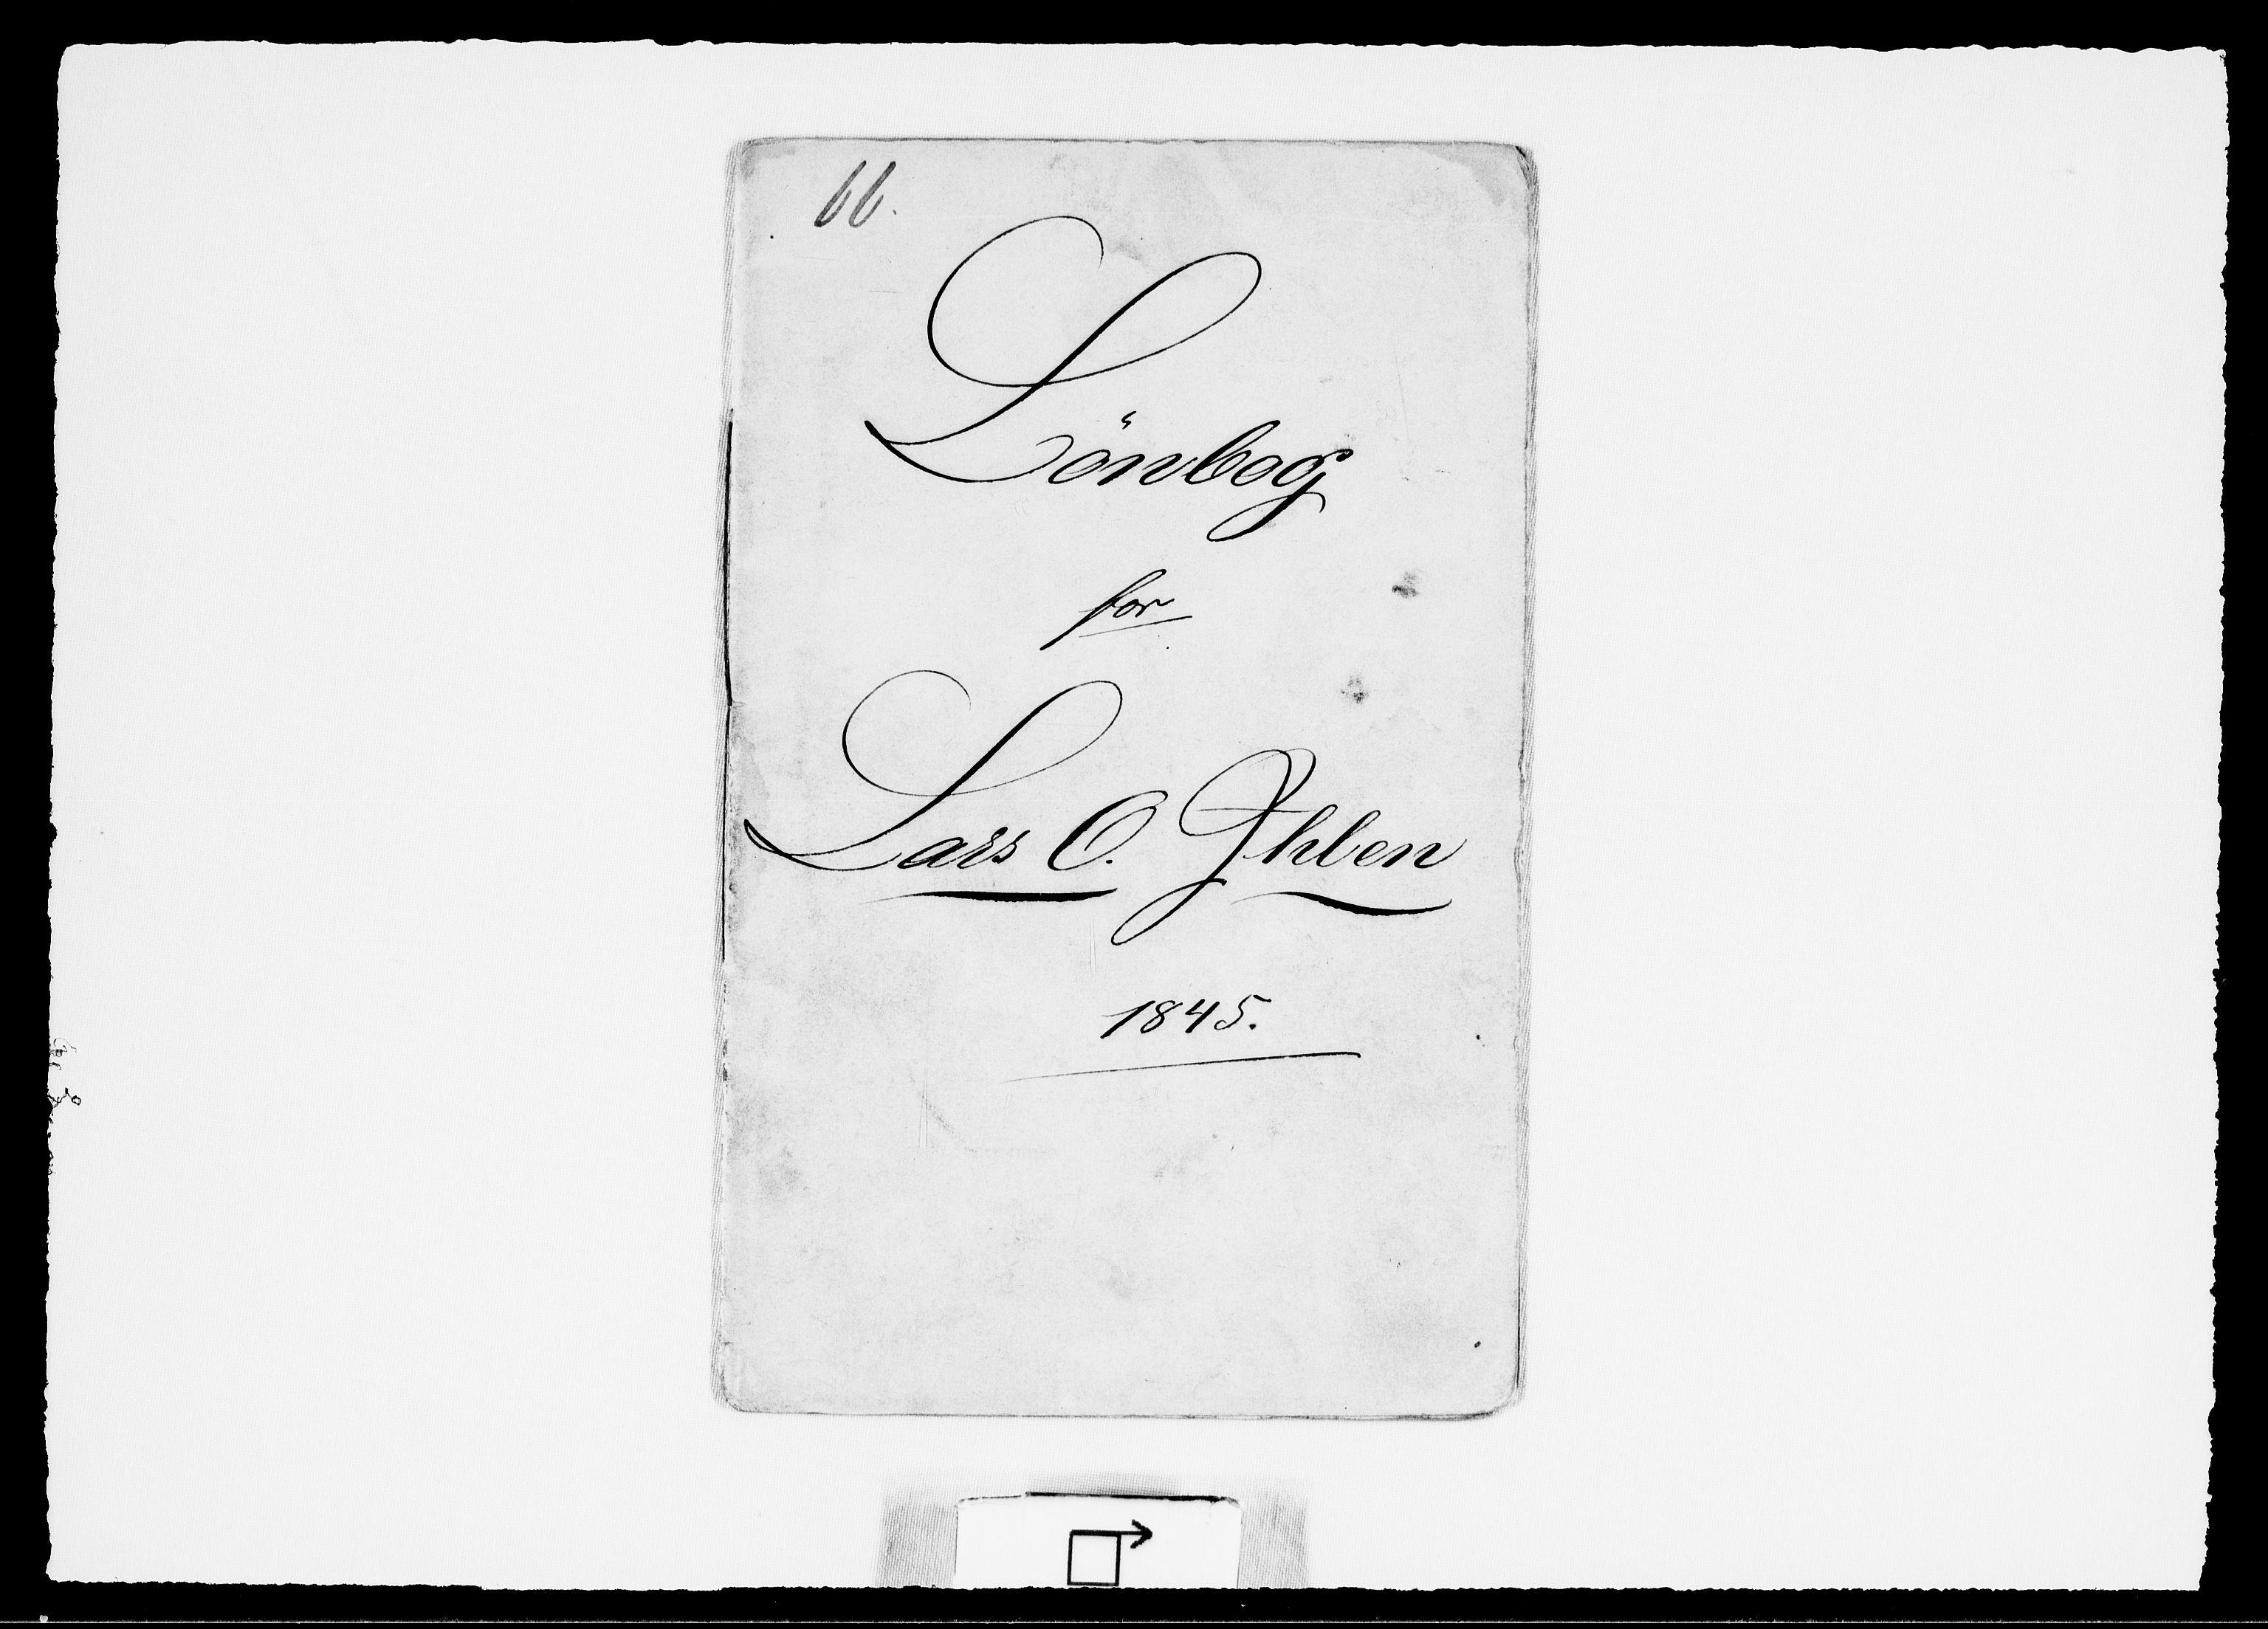 RA, Modums Blaafarveværk, G/Gd/Gdd/L0300, 1845-1849, s. 2